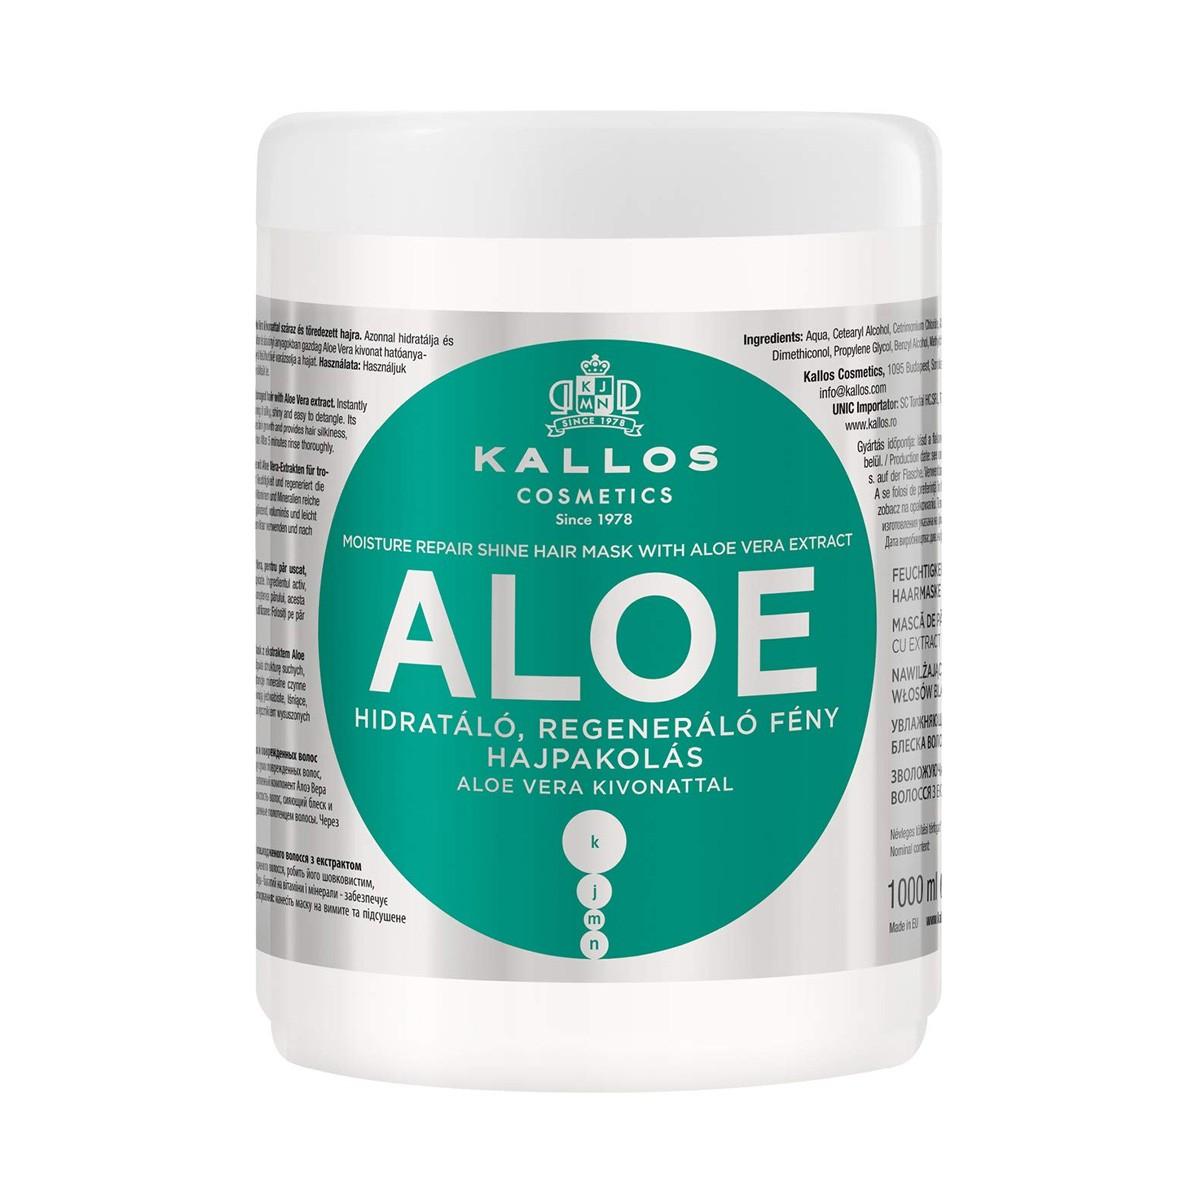 KALLOS KJMN Aloe Hair Mask 1000ml - Maska regenerująca i nawilżająca